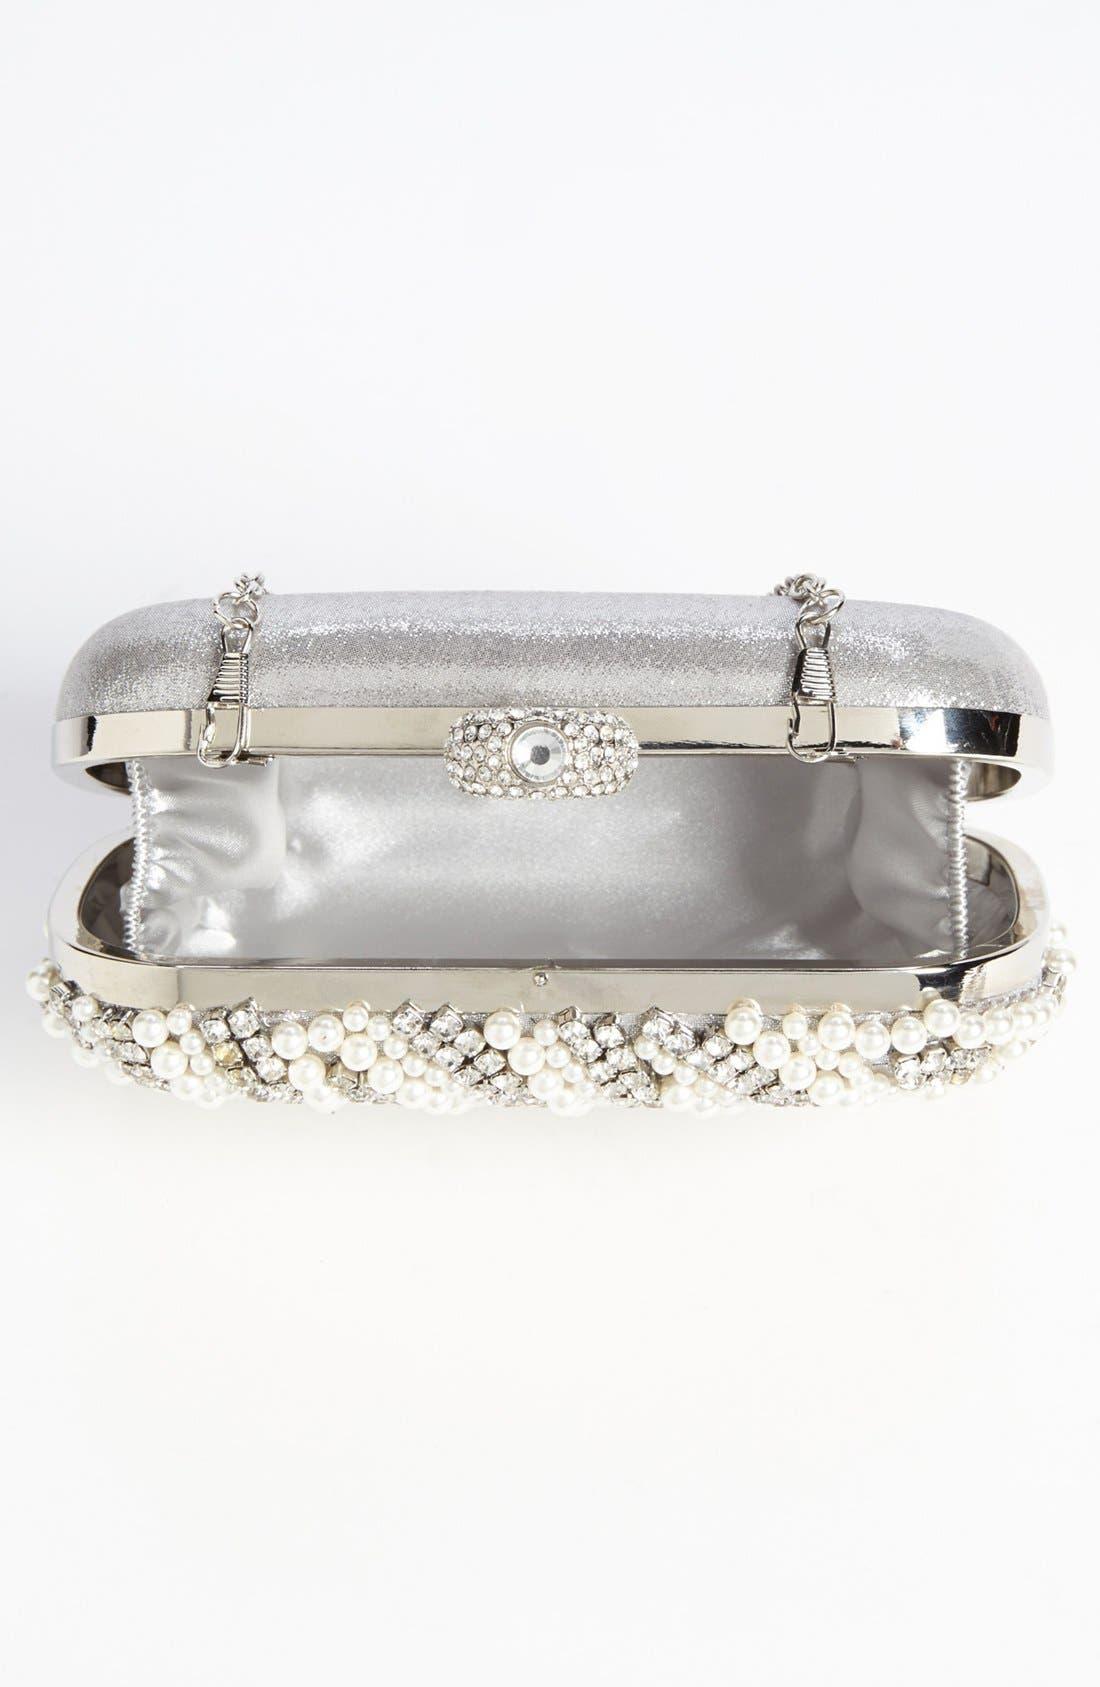 Alternate Image 3  - Tasha 'Pearl Stone' Clutch